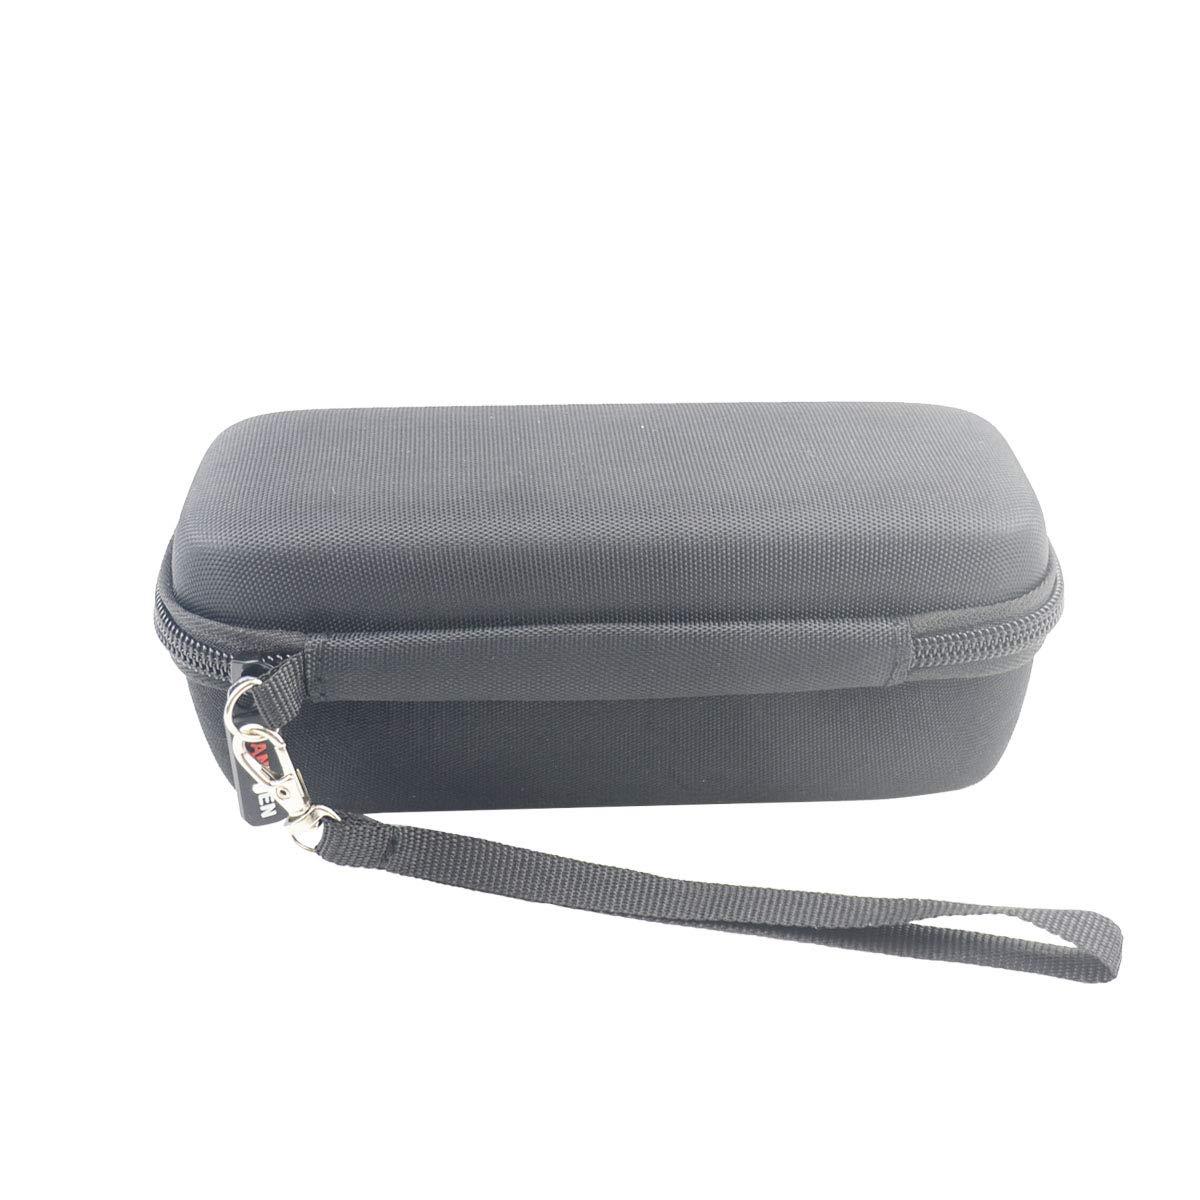 Altavoz Inal/ámbrico Port/átil Bluetooth Est/éreo Bluetooth 4.0 SANVSEN-Bolsa de Viaje Duro para Anker SoundCore